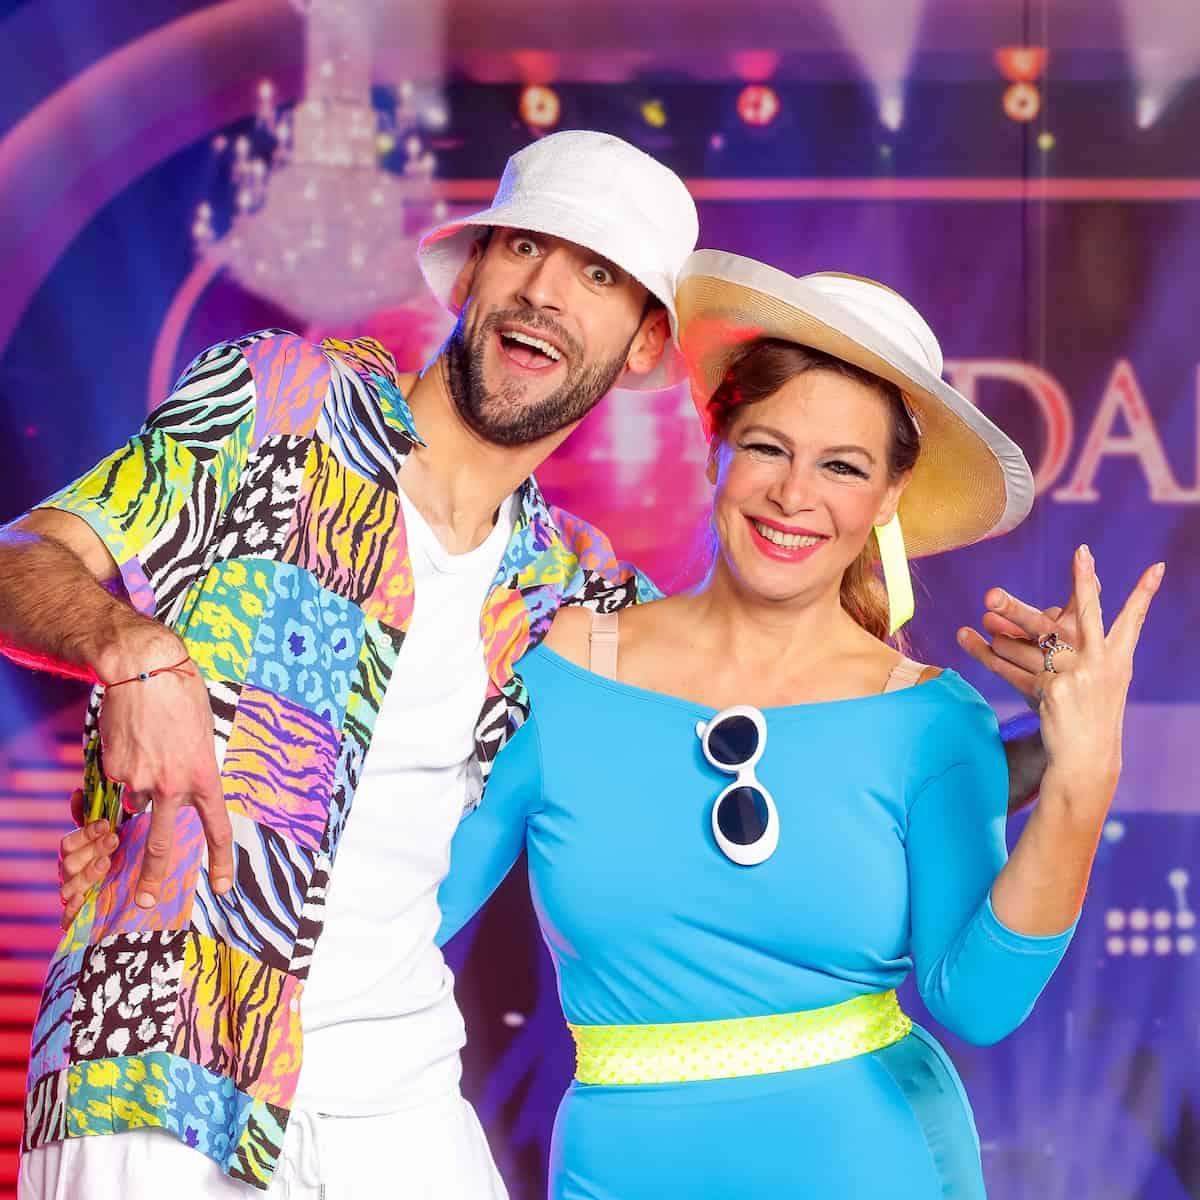 Im Halbinfale Dancing Stars 2020 ausgeschieden Natalia Ushakova - Dimitar Stefanin